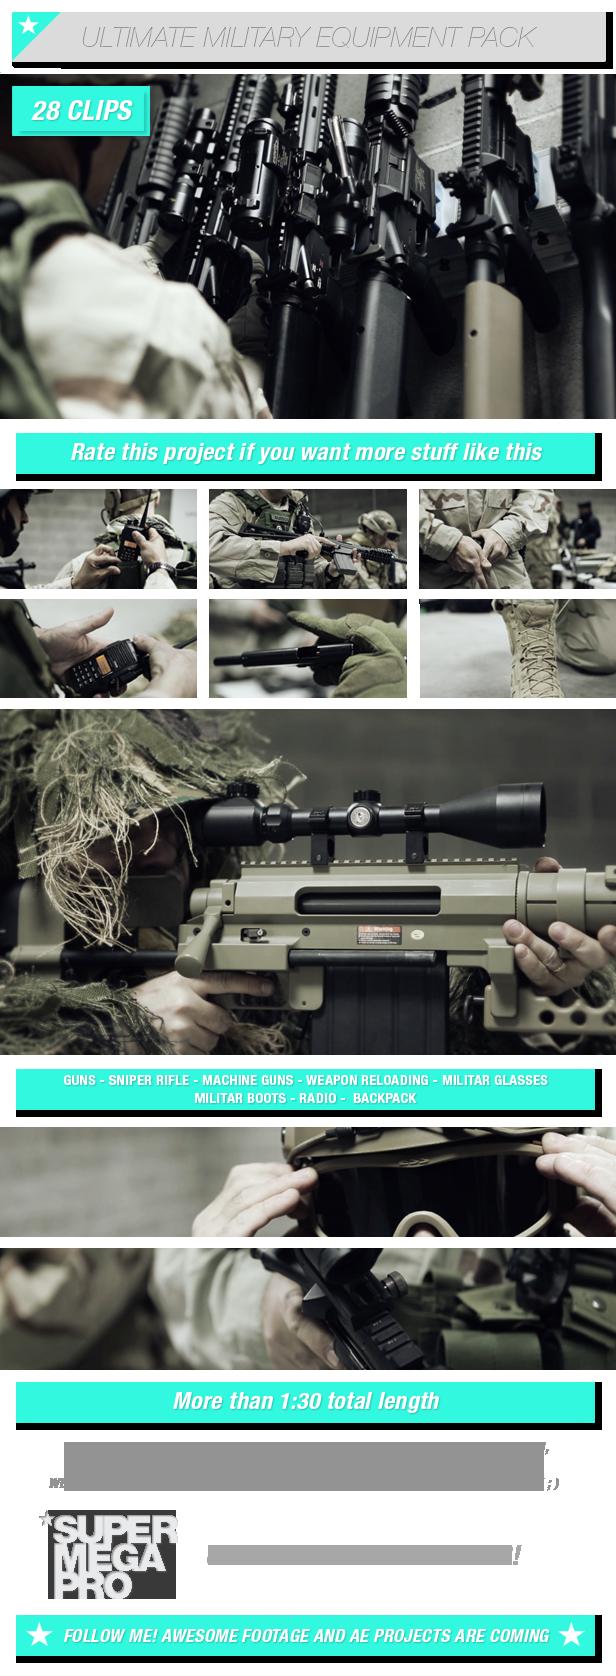 plantilla-military